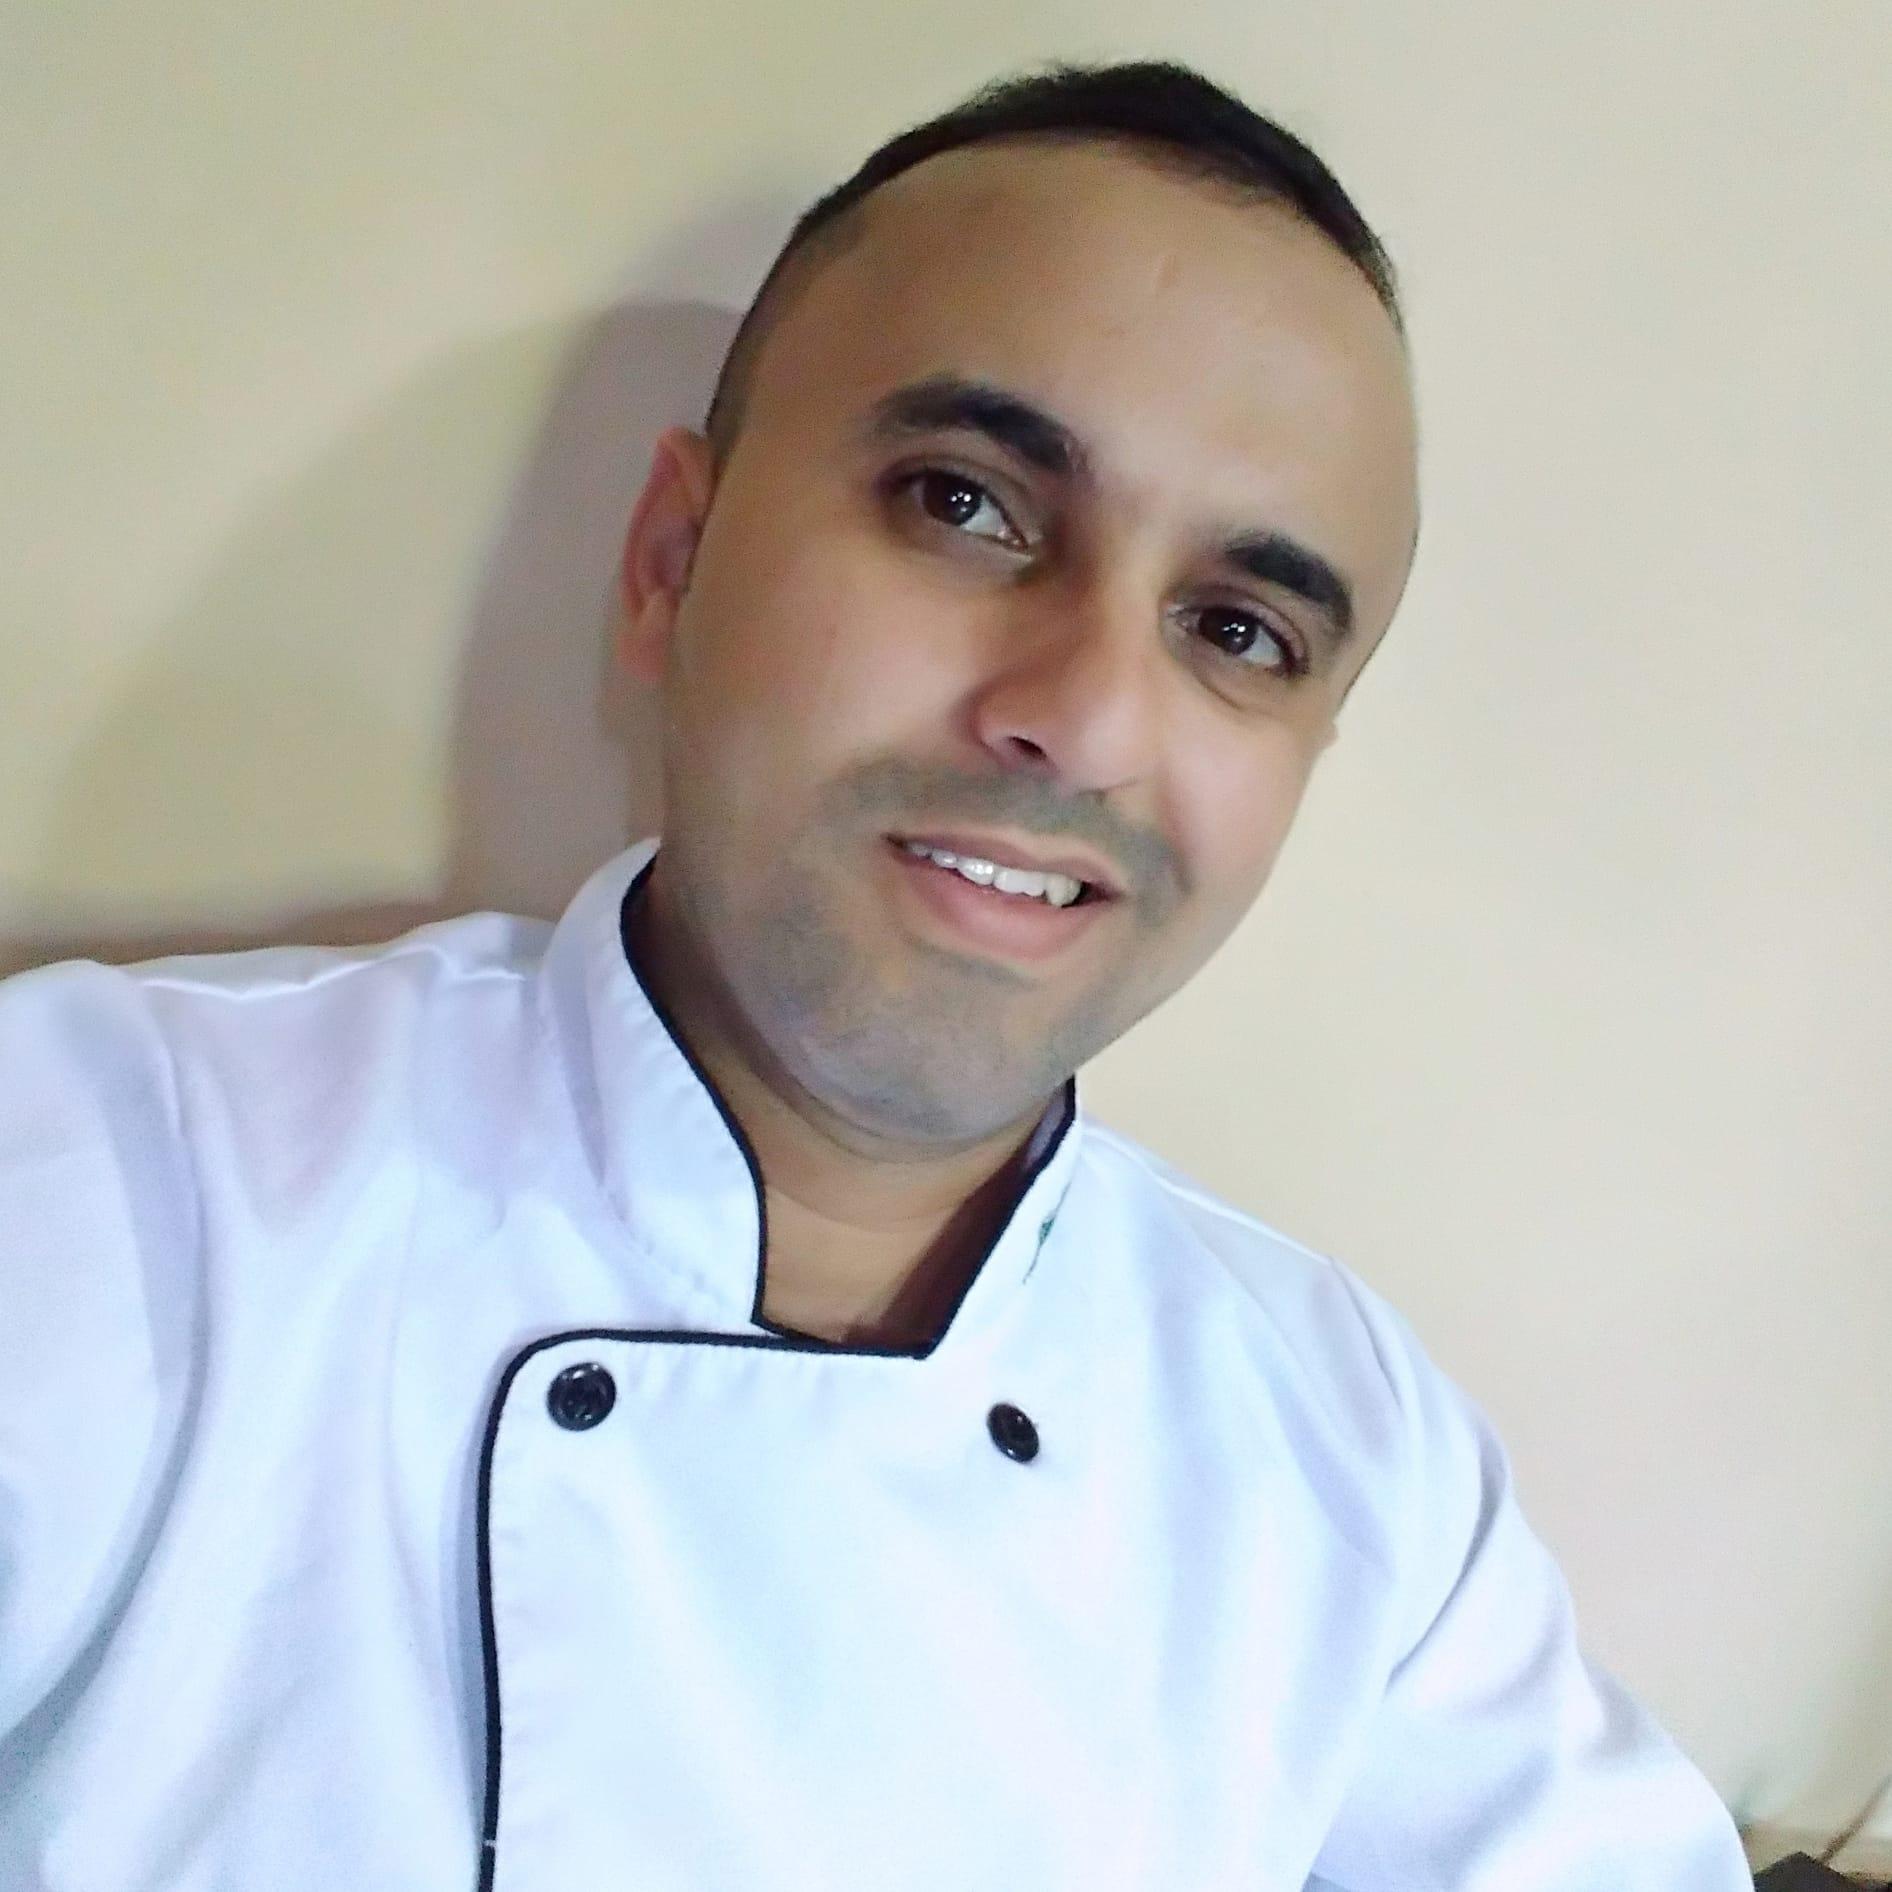 Chef Francisco